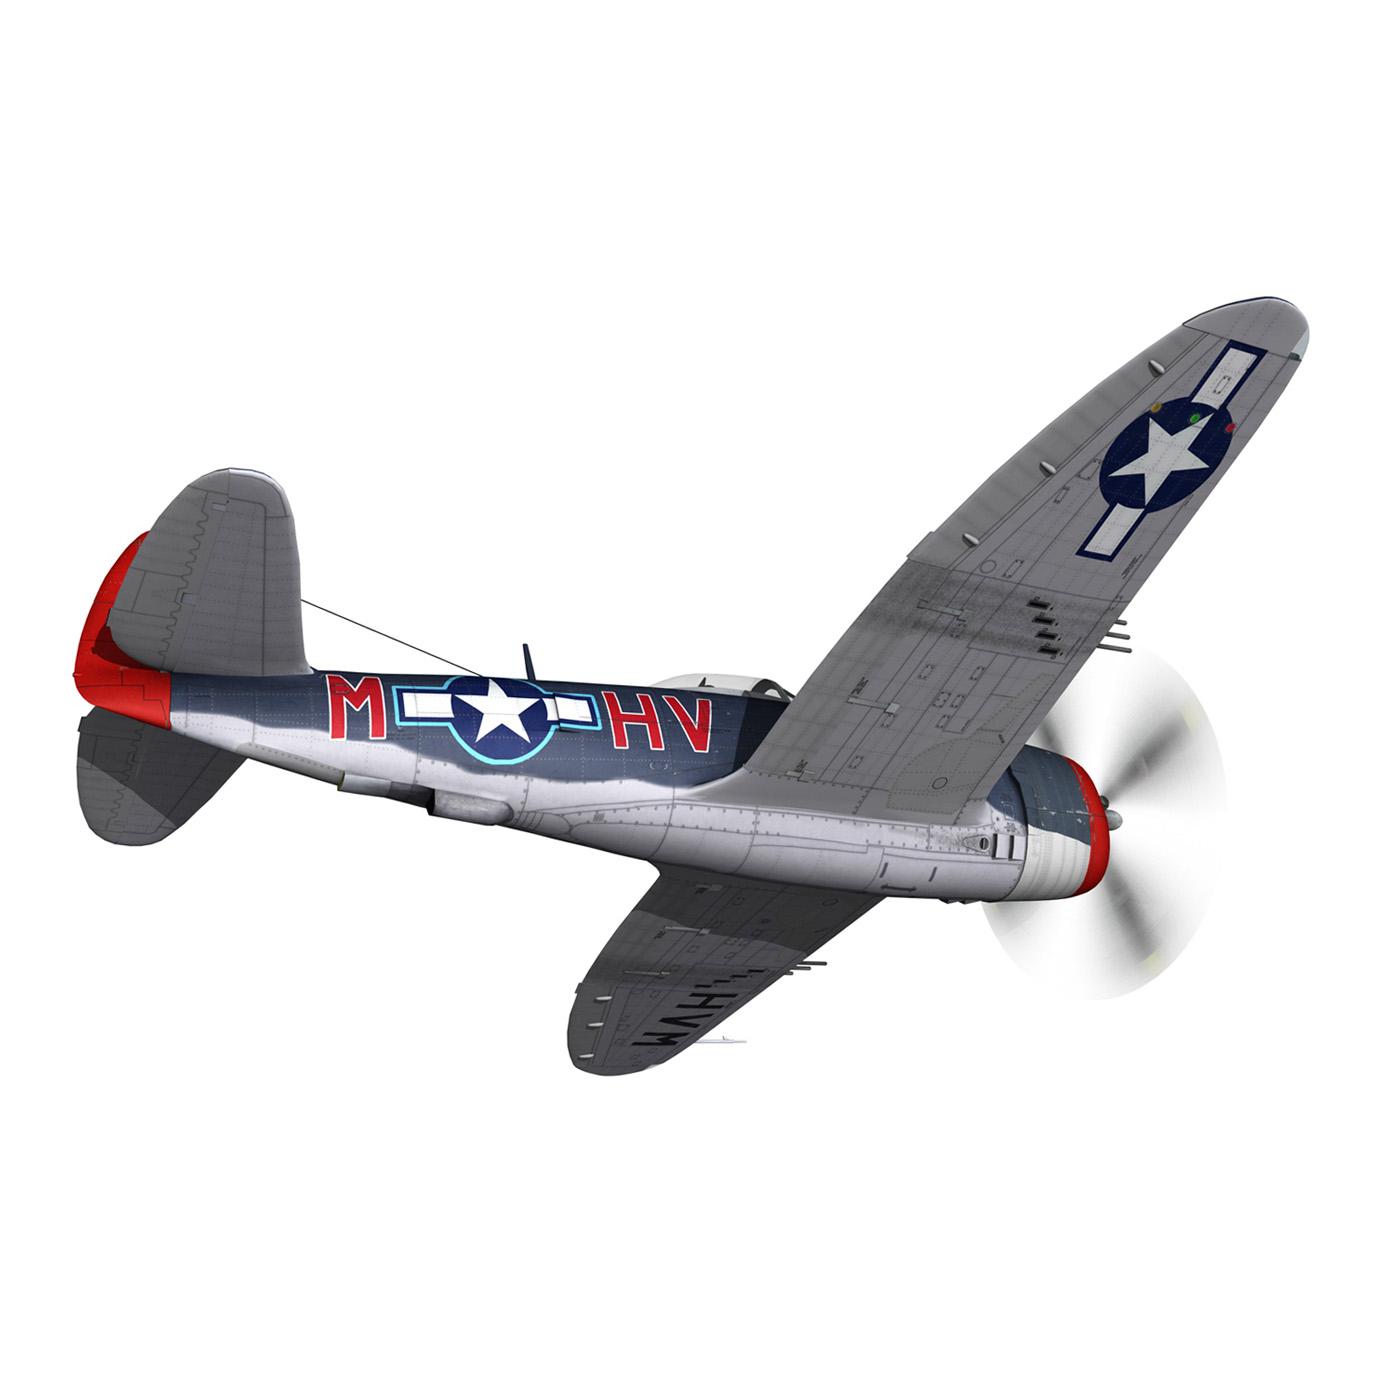 republic p-47m thunderbolt – pengie v 3d model 3ds c4d fbx lwo lw lws obj 279720